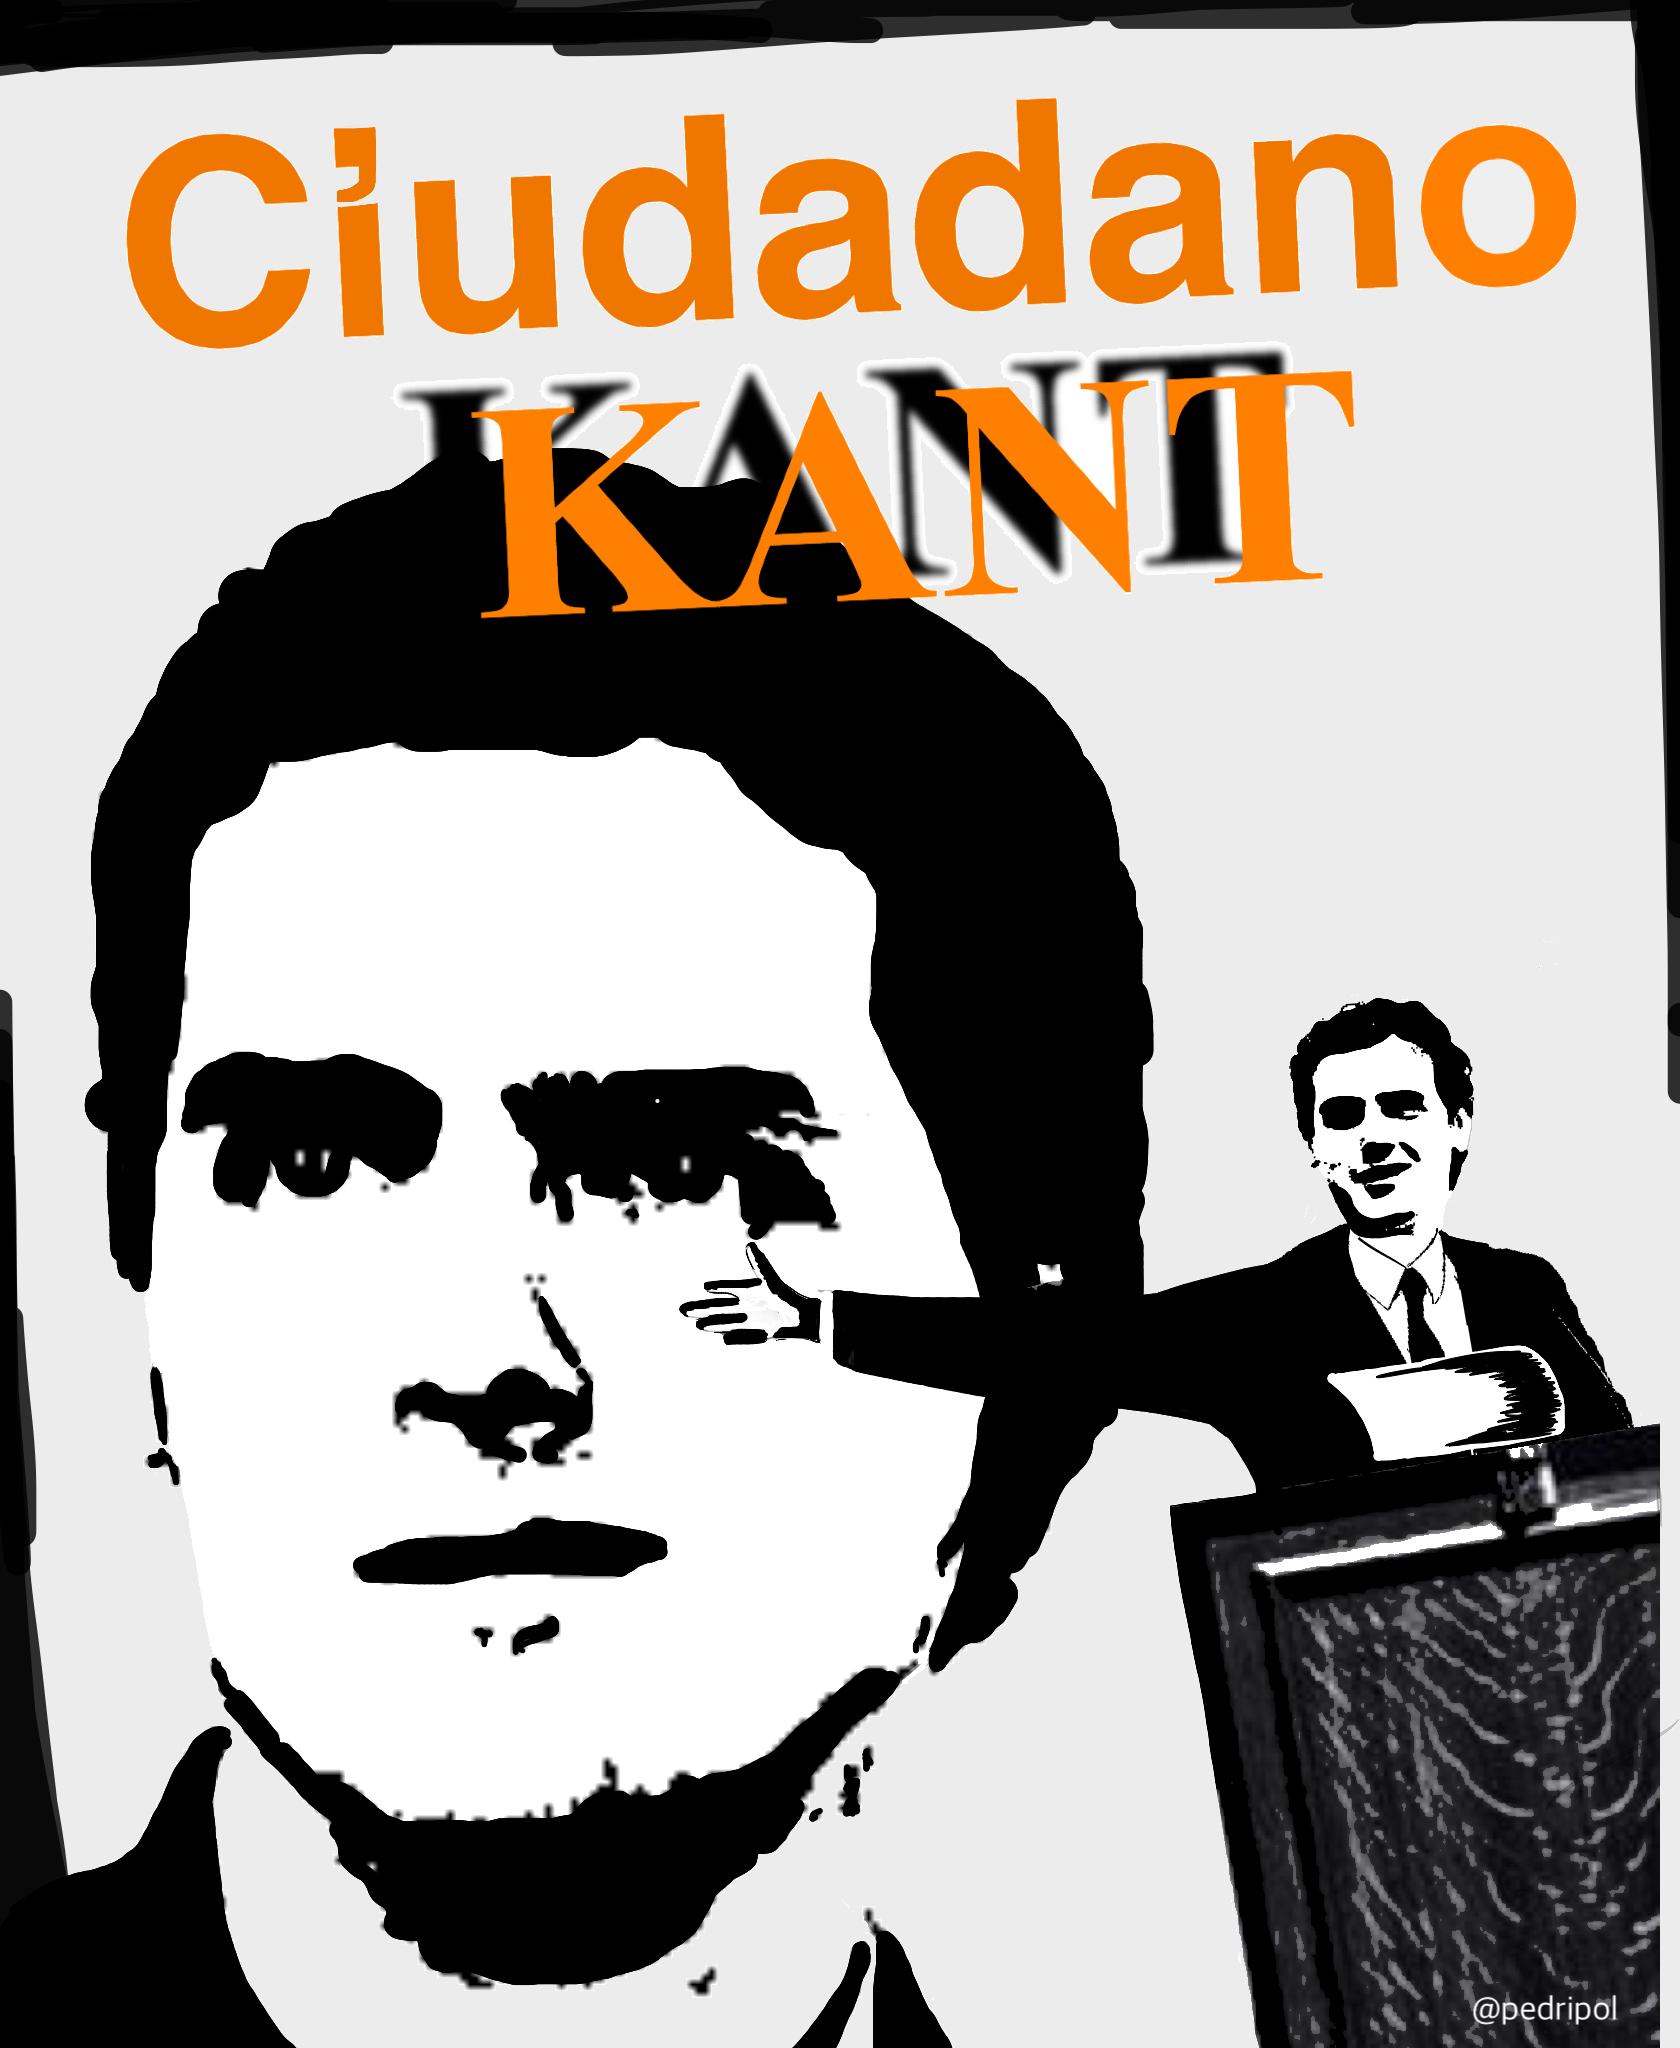 Ciudadano Kant